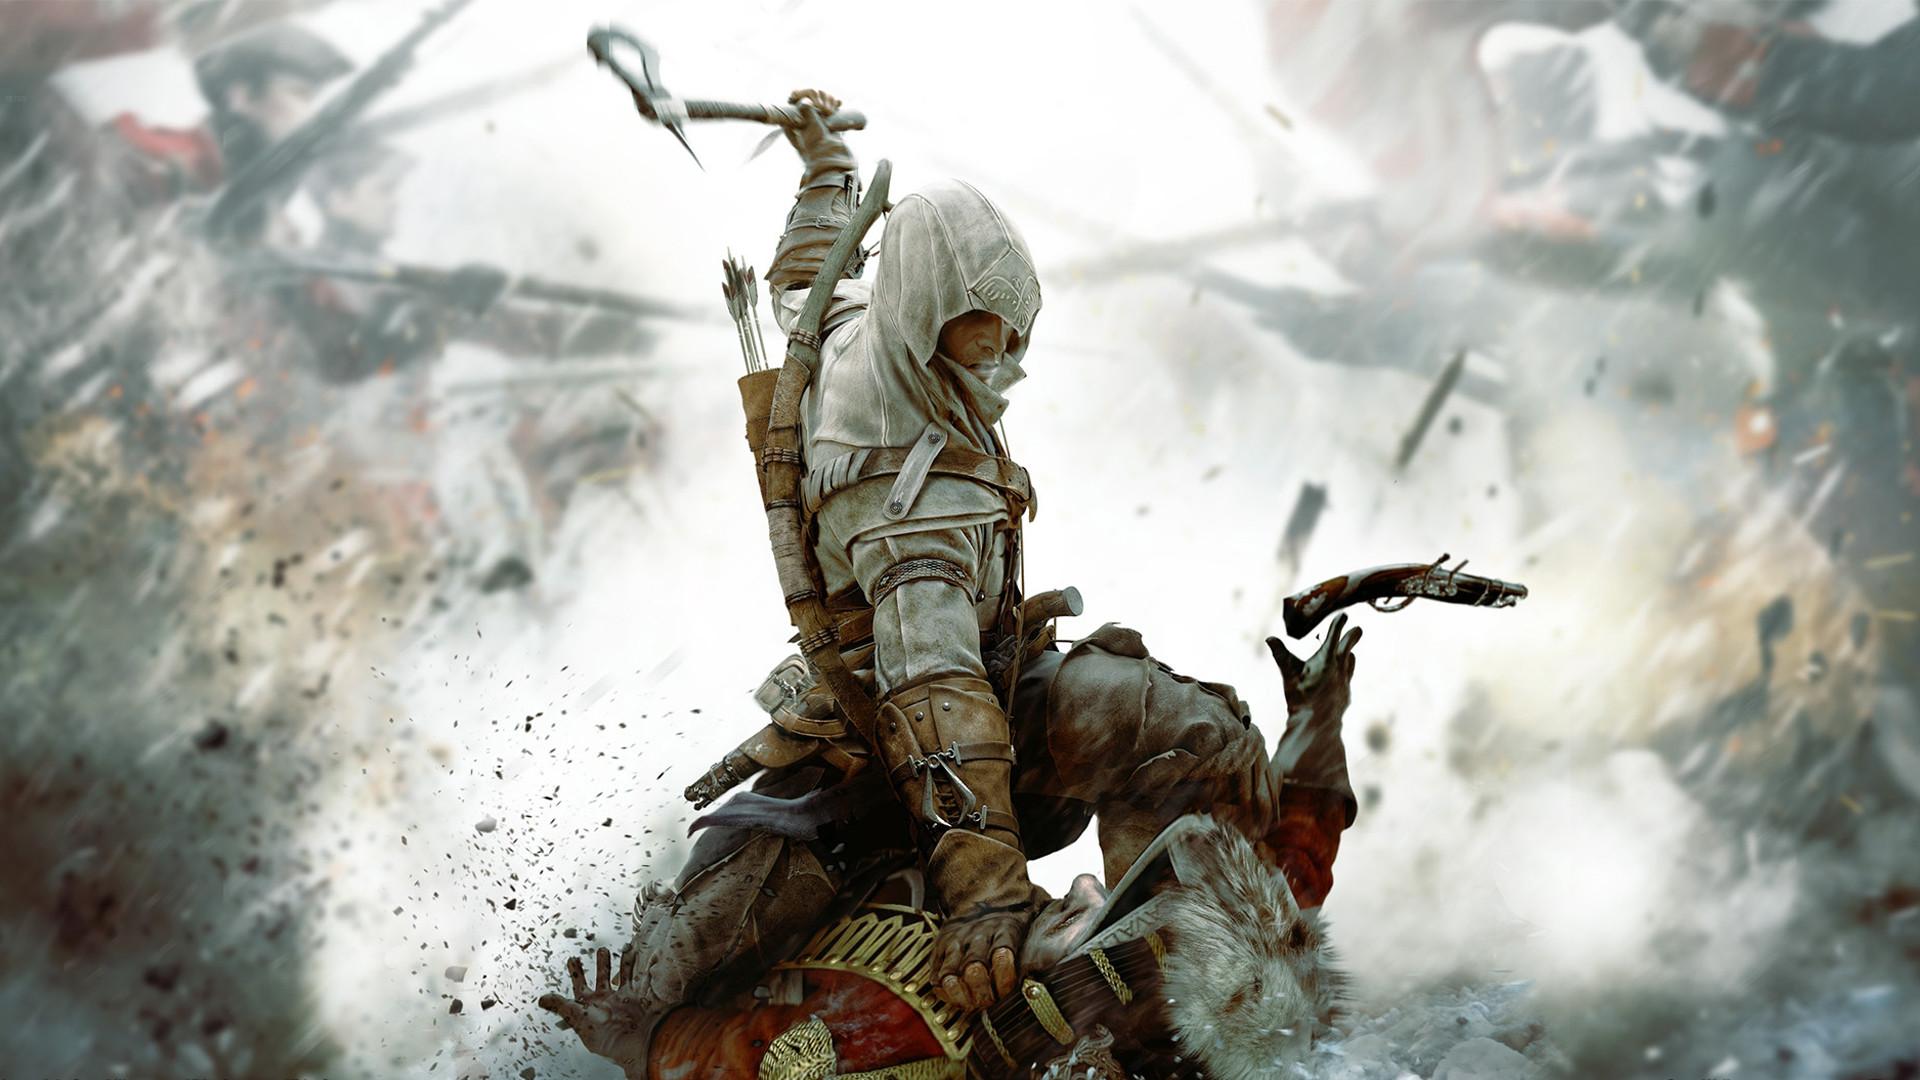 Assassins Creed 3 Wallpaper Wallpapertag